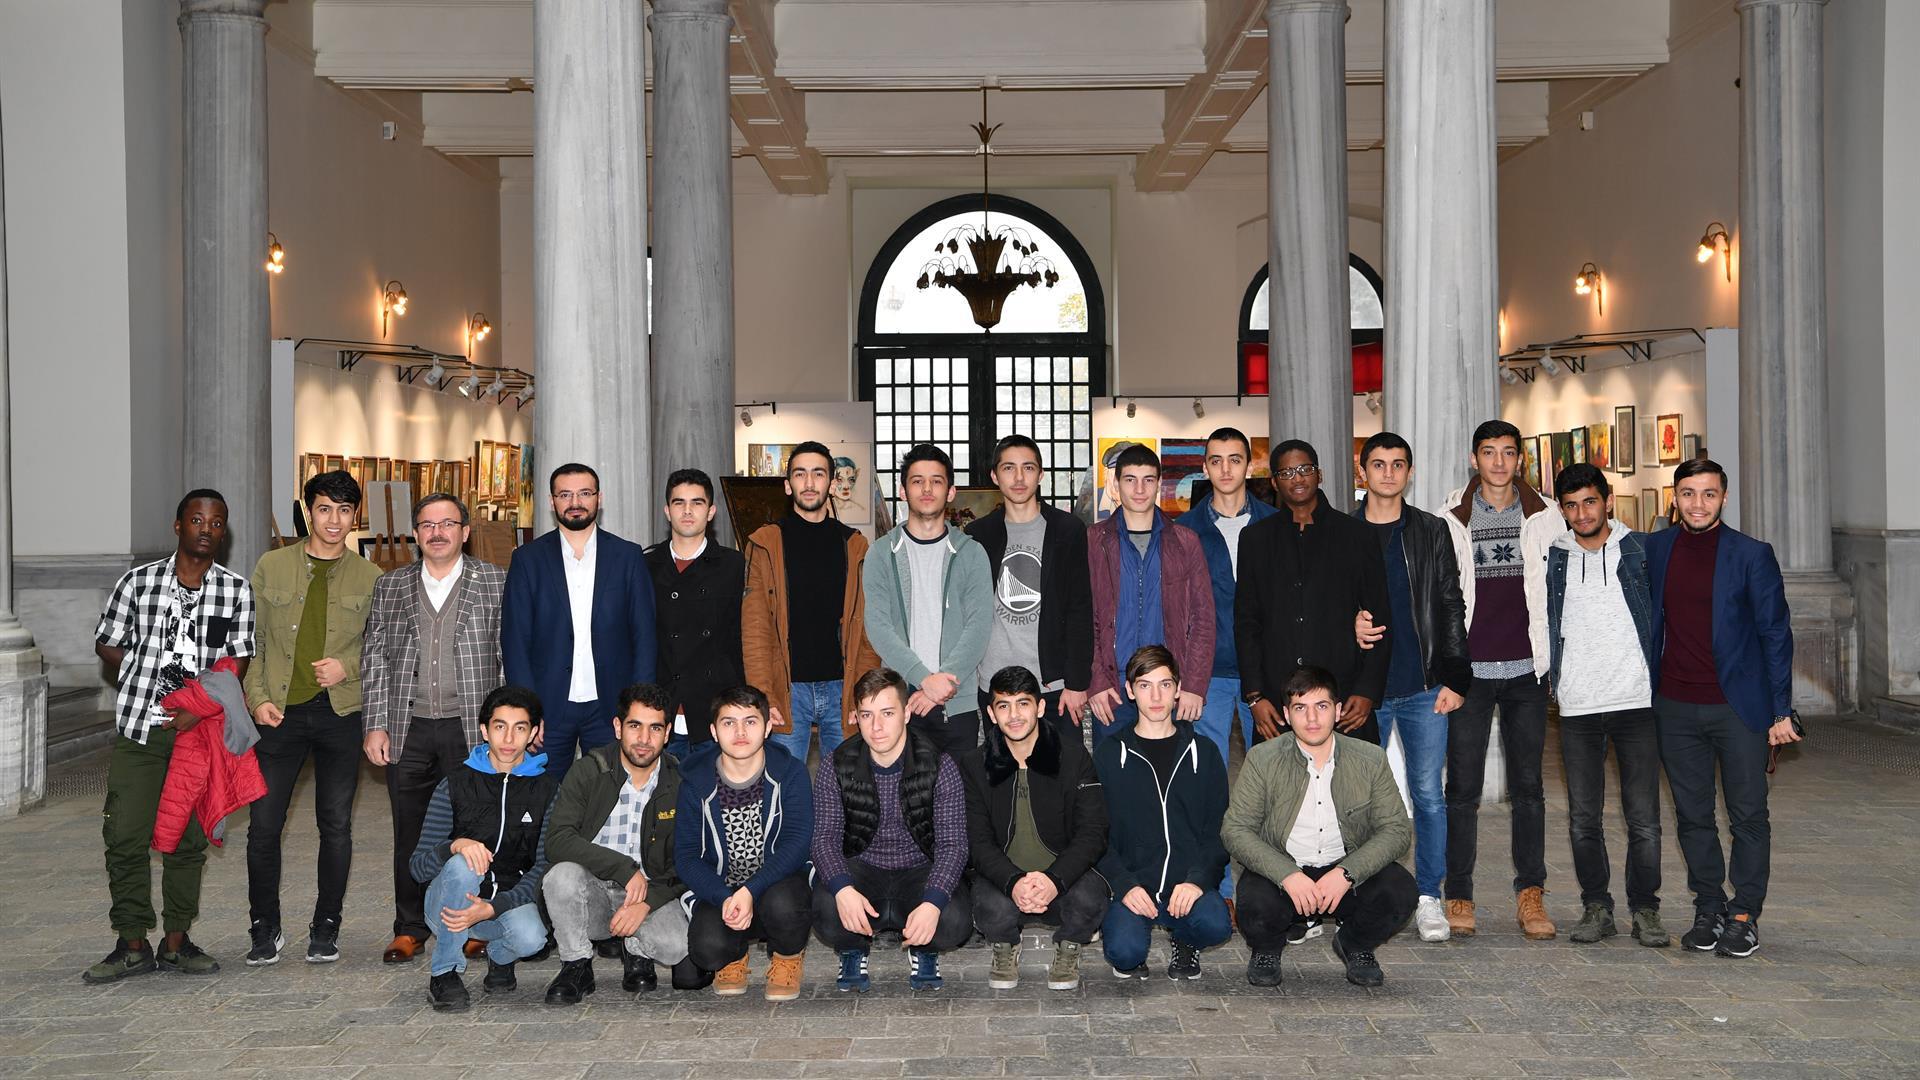 İlim-Yayma-Cemiyeti-İstanbul-Üniversitesi'ni-Ziyaret-Etti